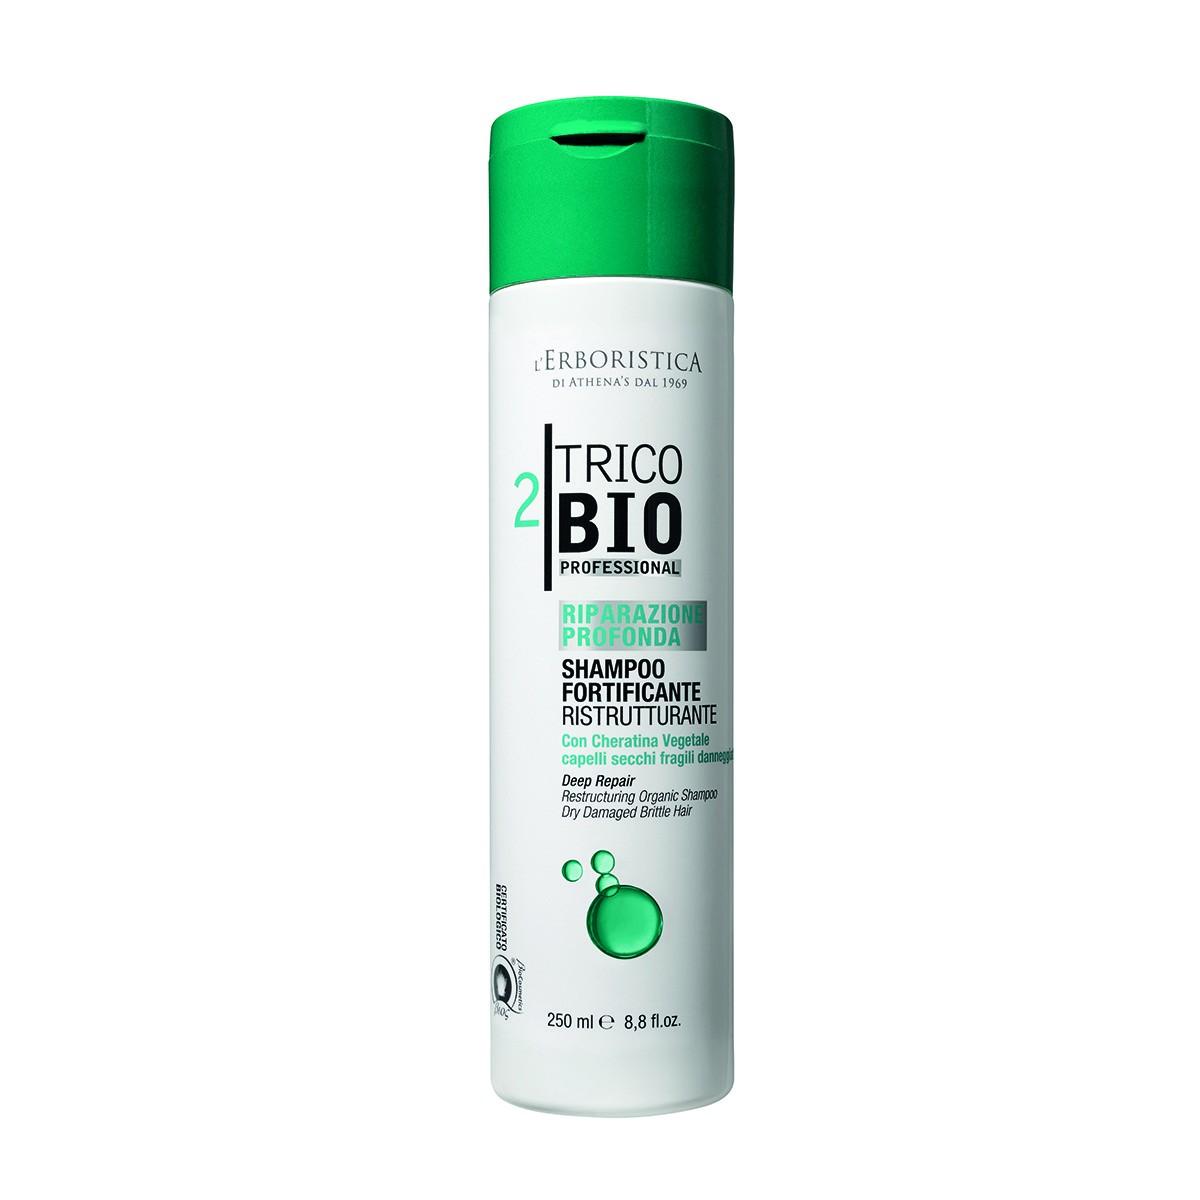 Athena's TricoBiO深層修護重健洗髮乳 250ml